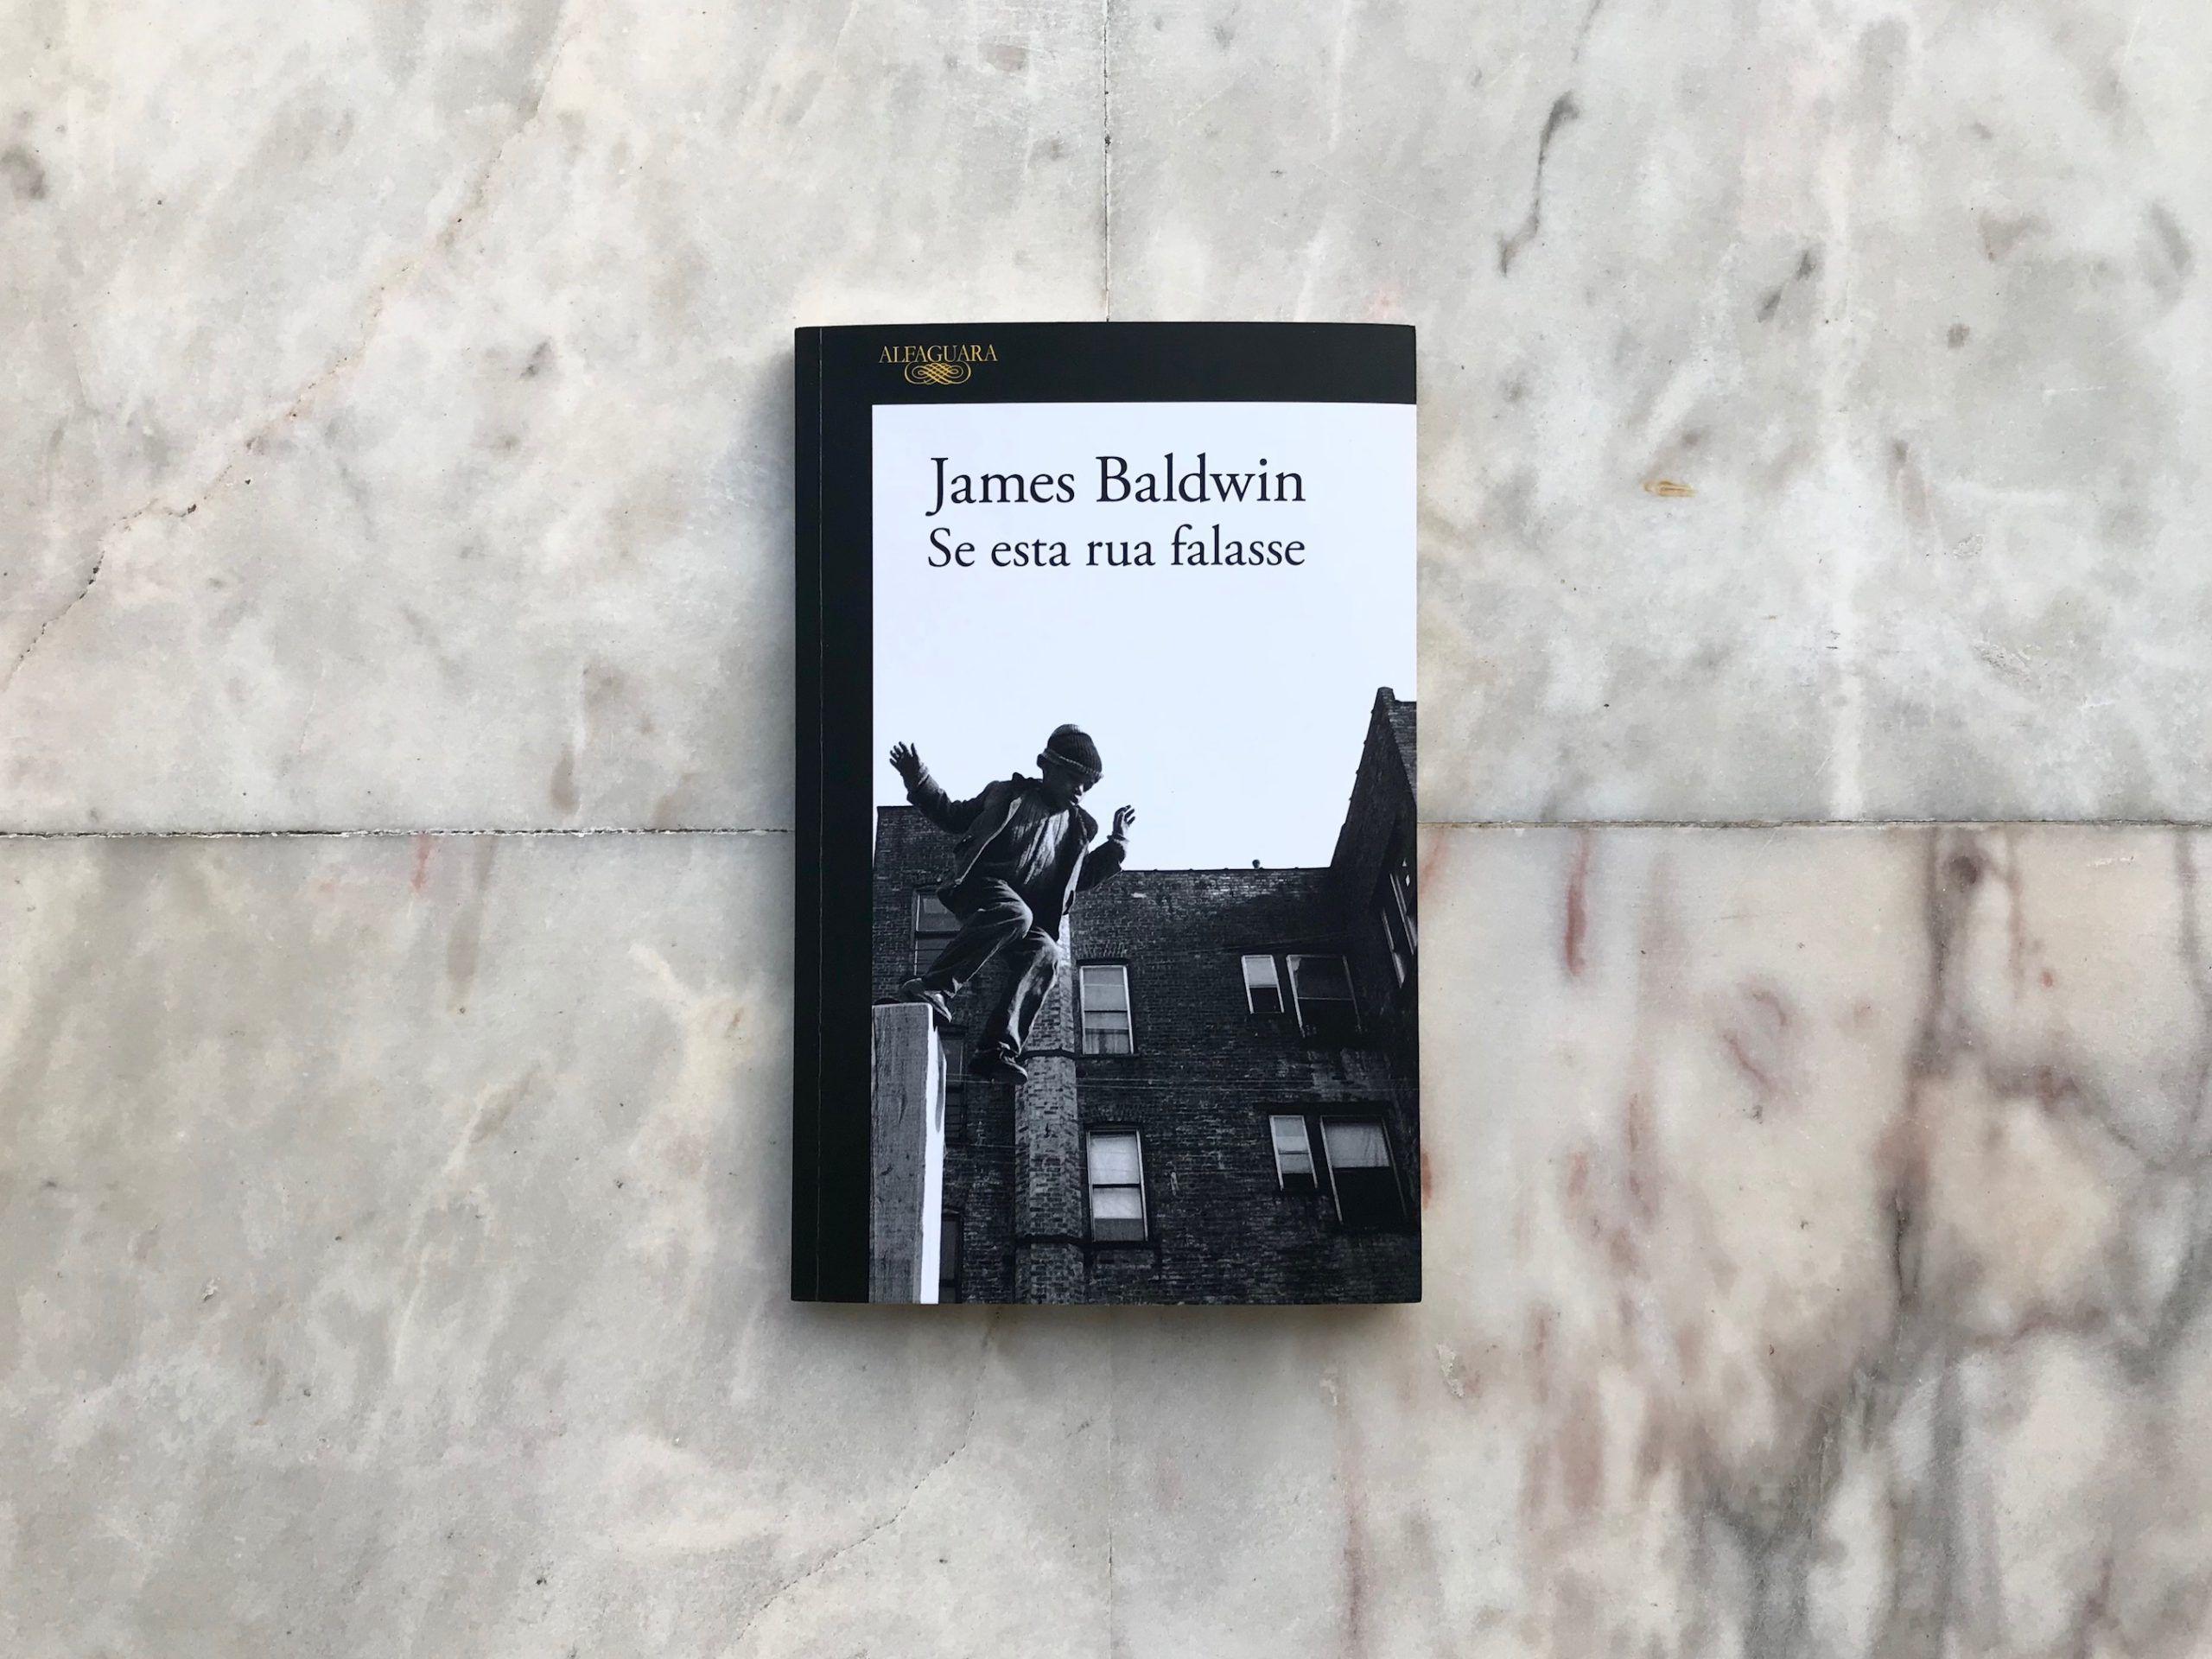 Terá a América mudado assim tanto desde os tempos de James Baldwin?